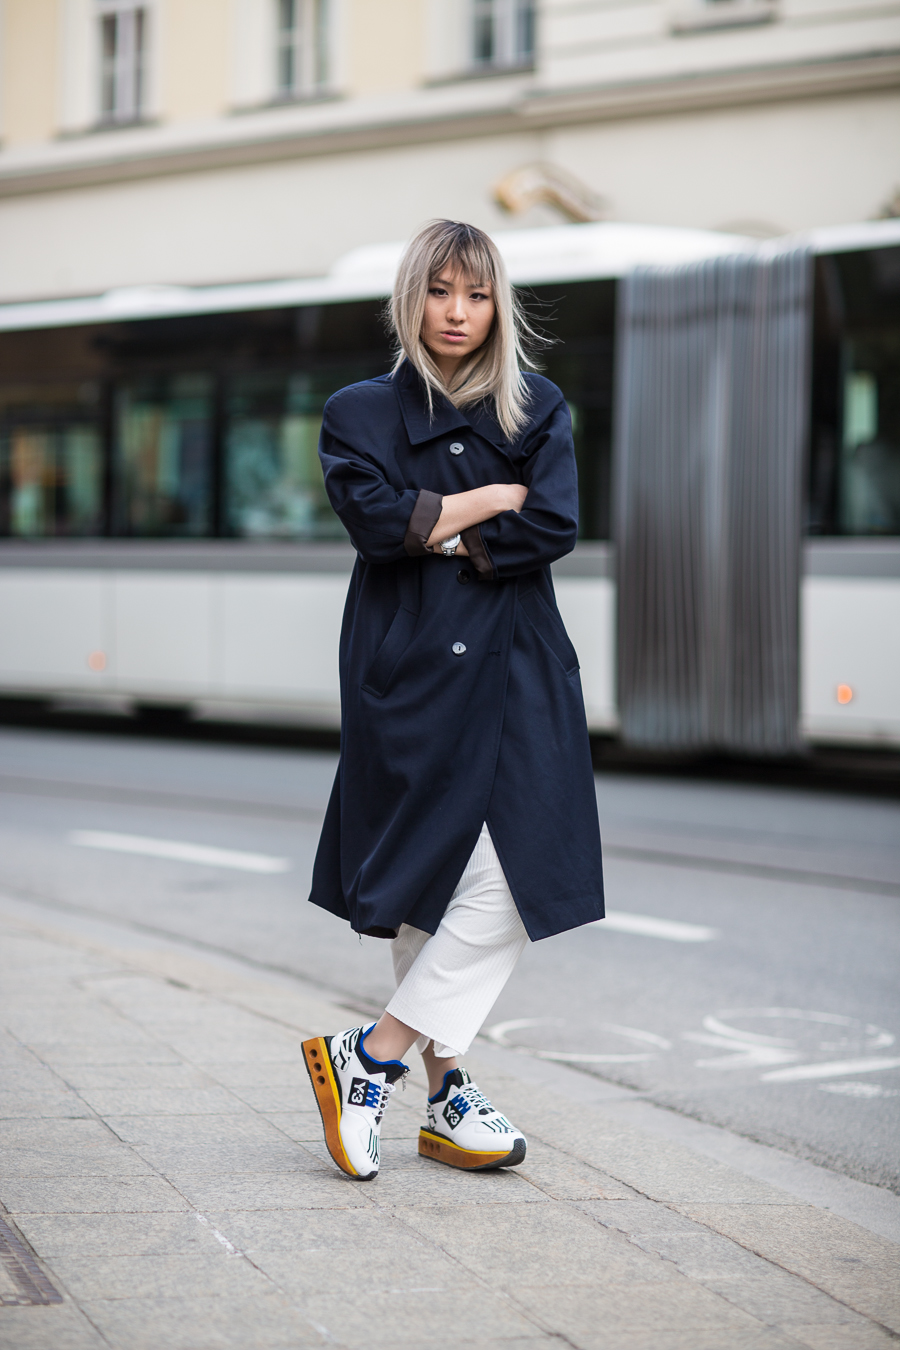 street-style-fashion-blog-innsbruck-miao-miao-yan